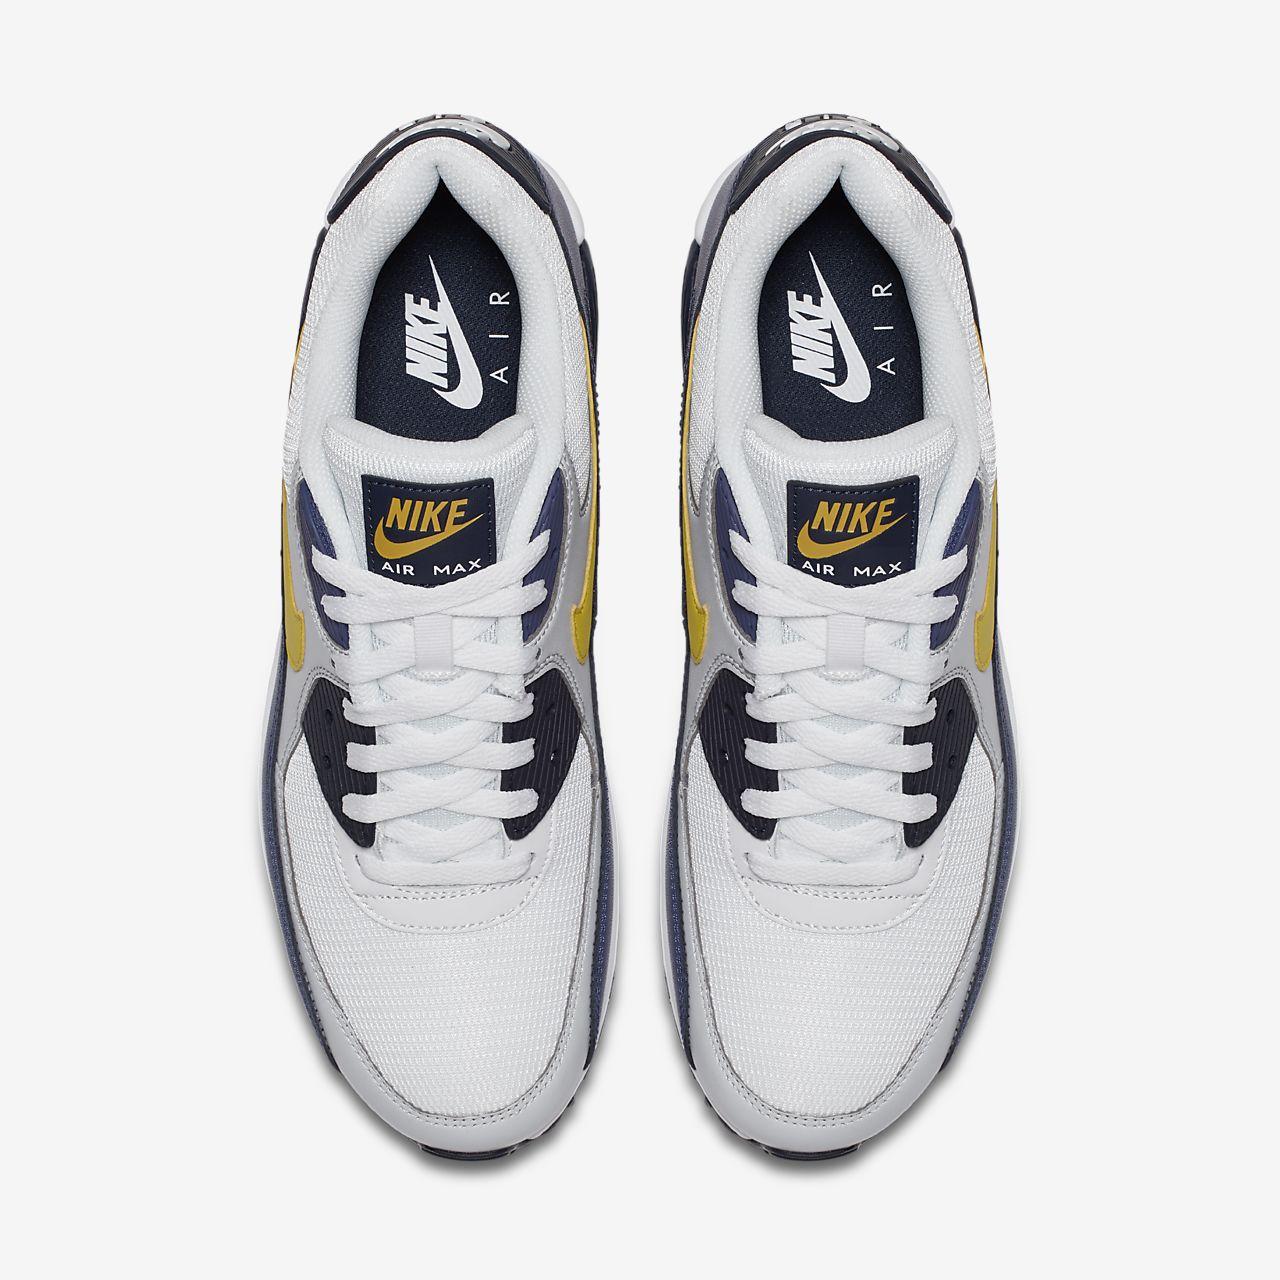 pas mal 54ada e9795 Nike Air Max 90 Essential Men's Shoe